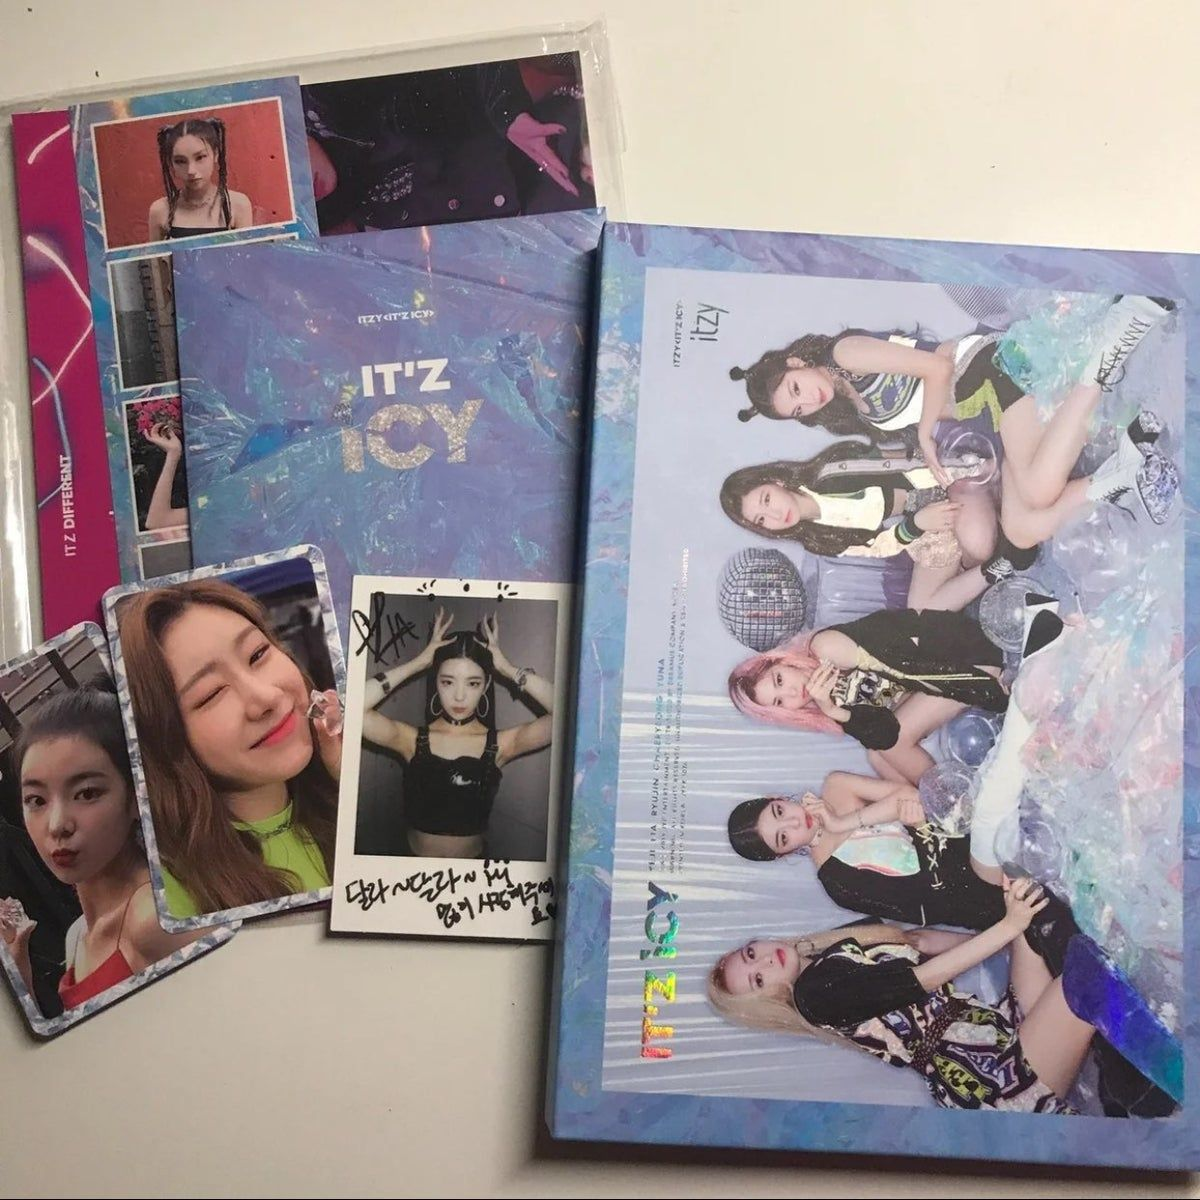 Itzy It'z Icy Album   Kpop merchandise, Kpop merch, Itzy